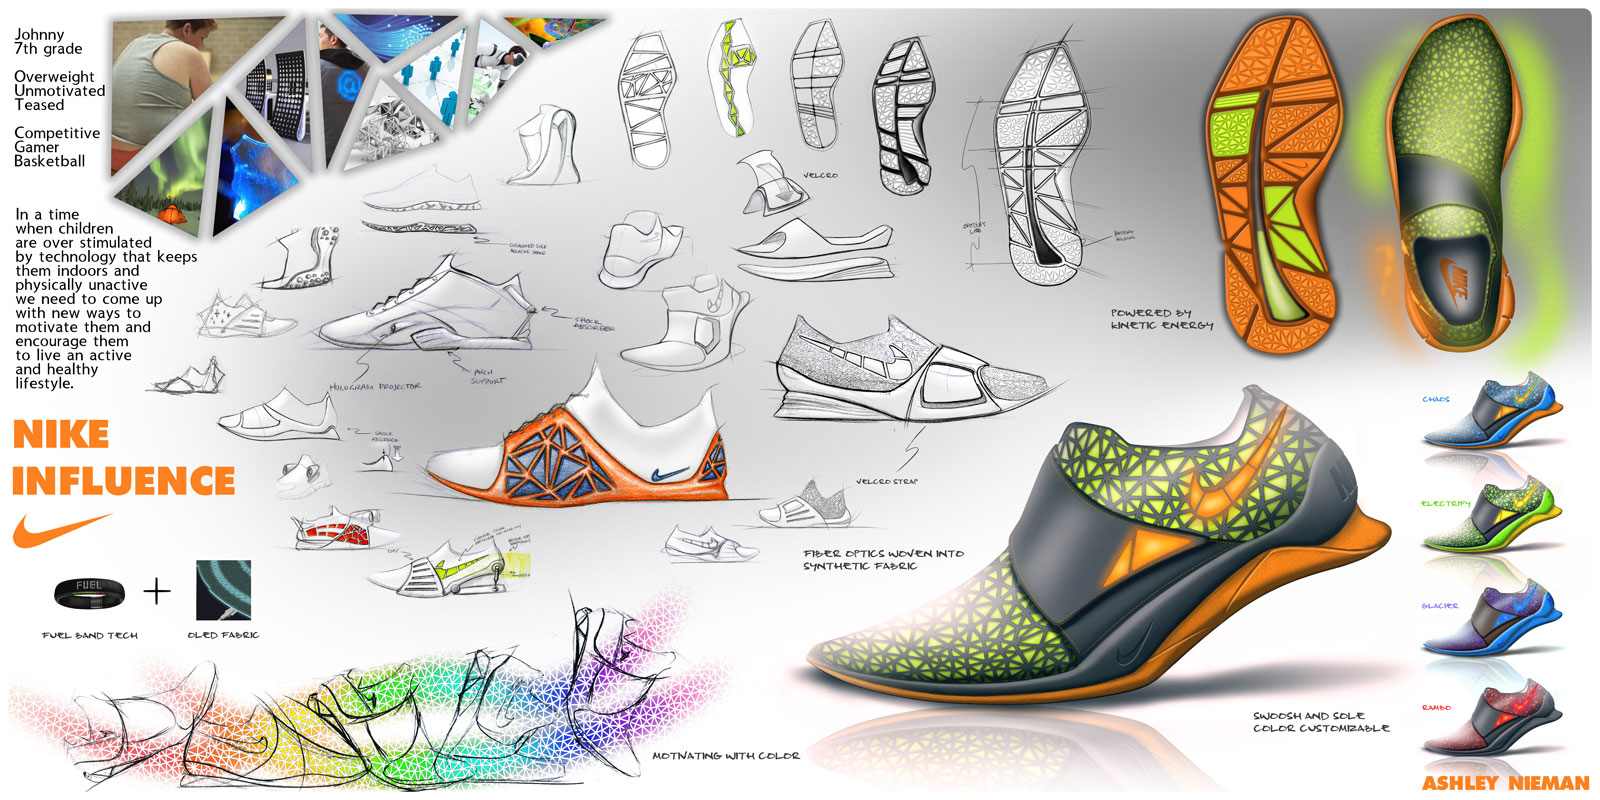 Nike Influence Shoe Concept Car Body Design